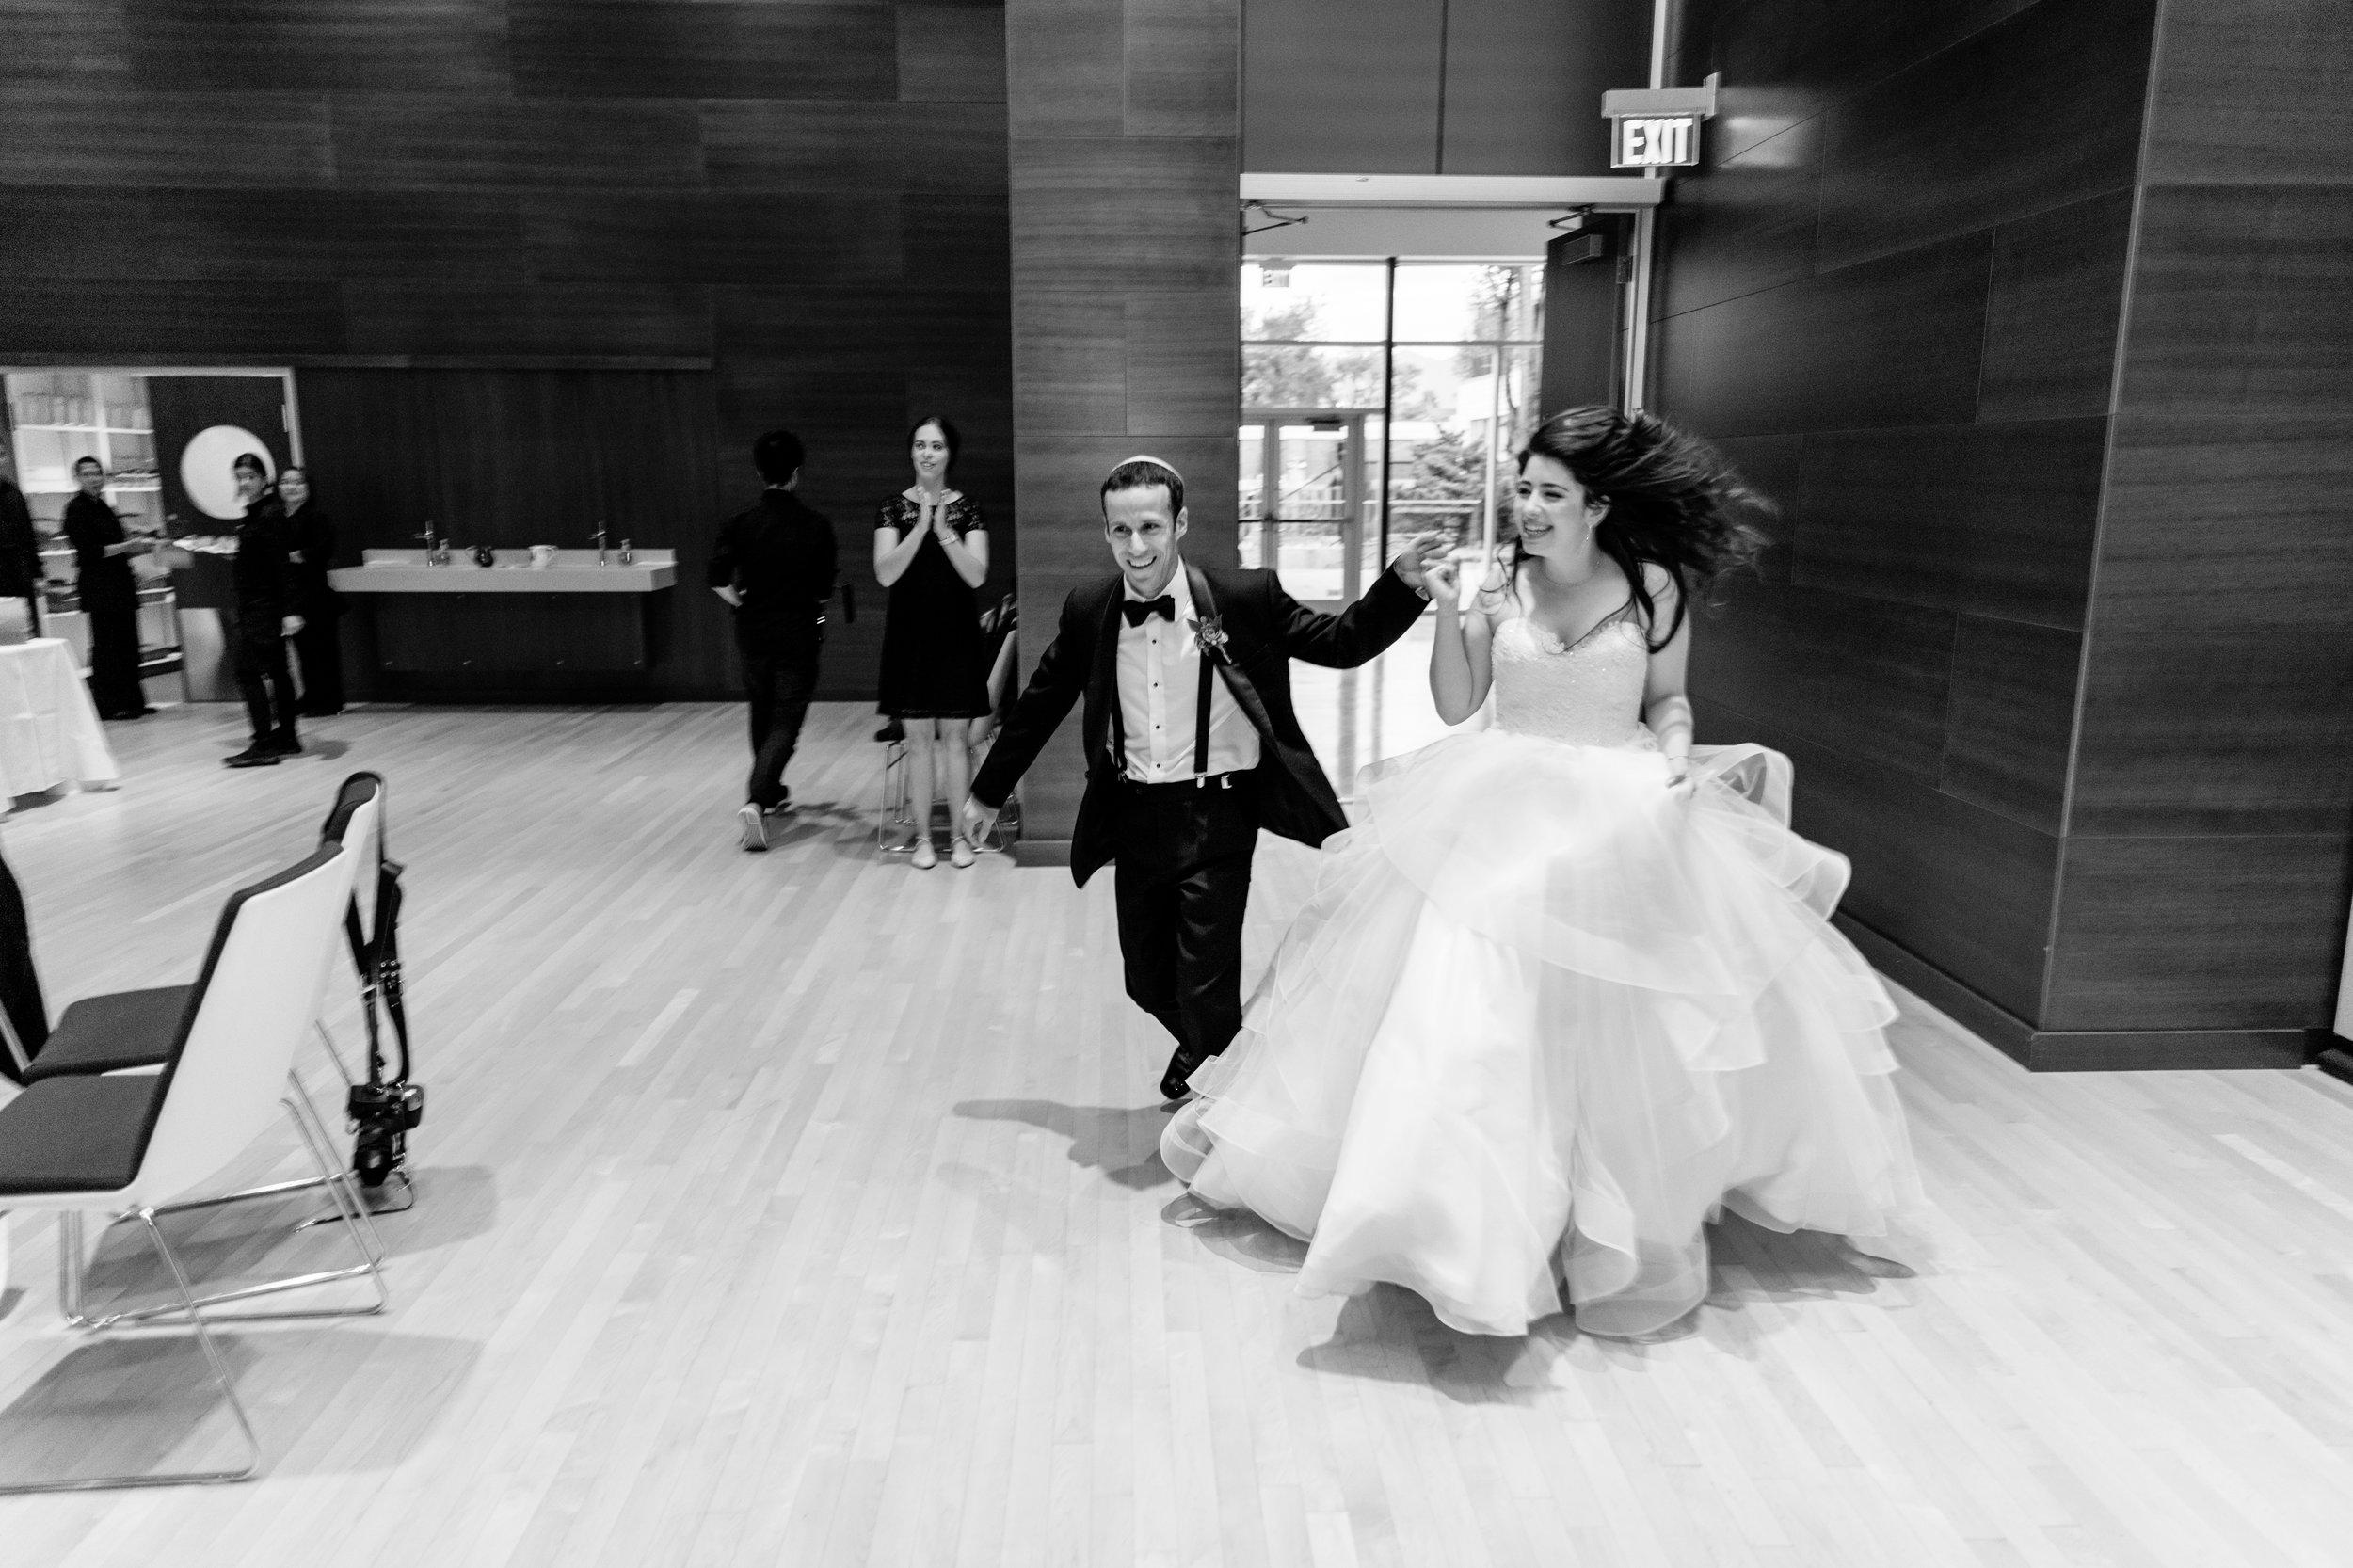 herastudios_wedding_tania_oren_hera_selects-59.jpg